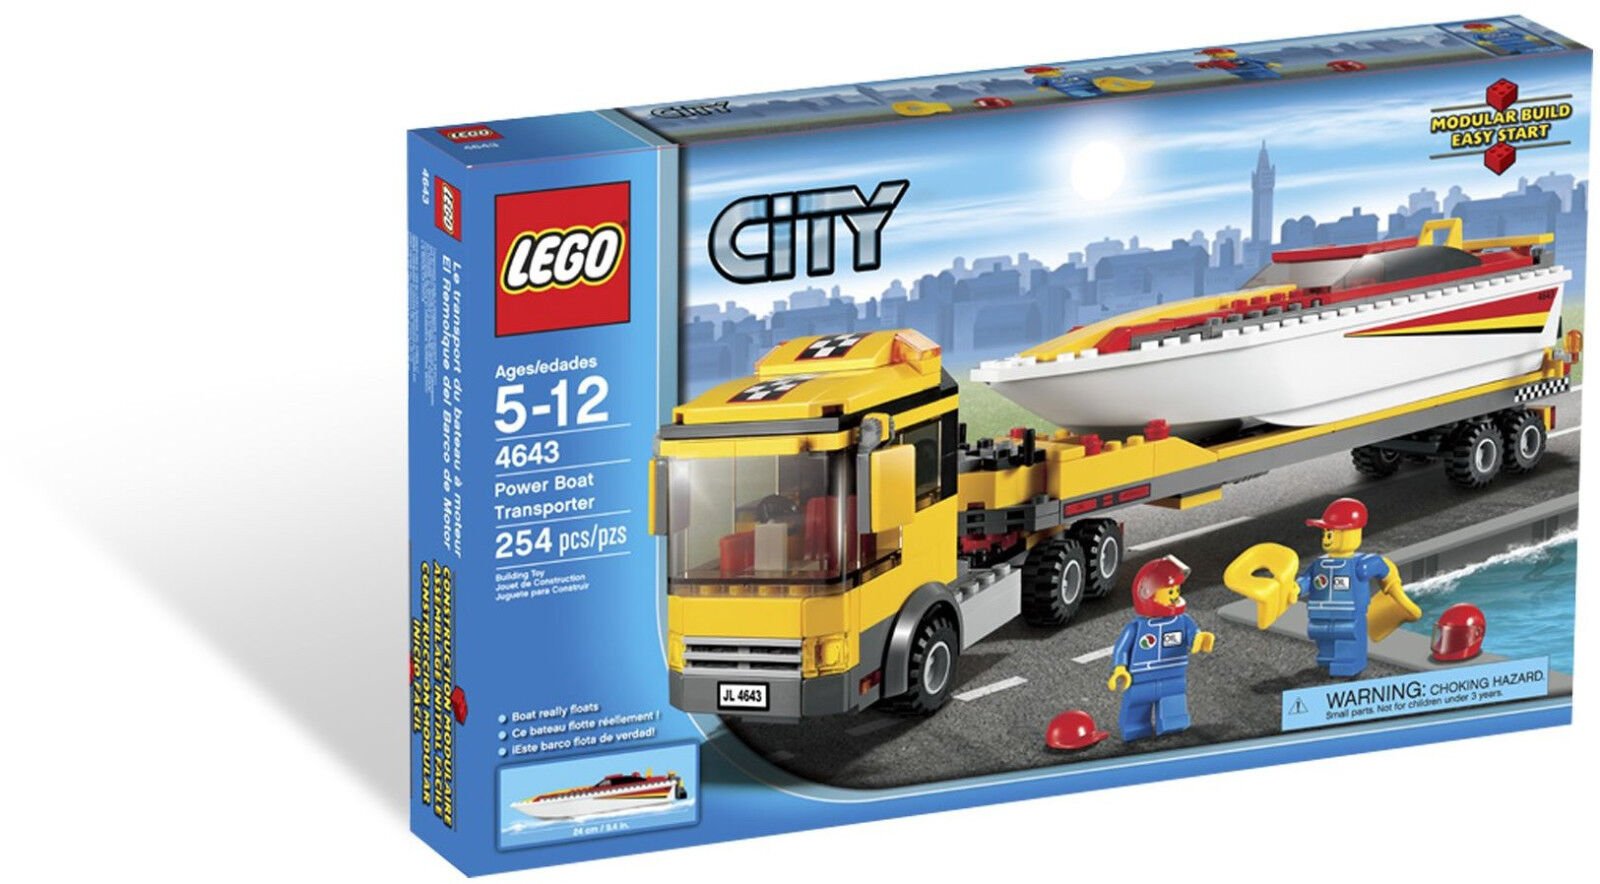 LEGO City - 4643 Power Boat Transporter - Neu & & & OVP be466e